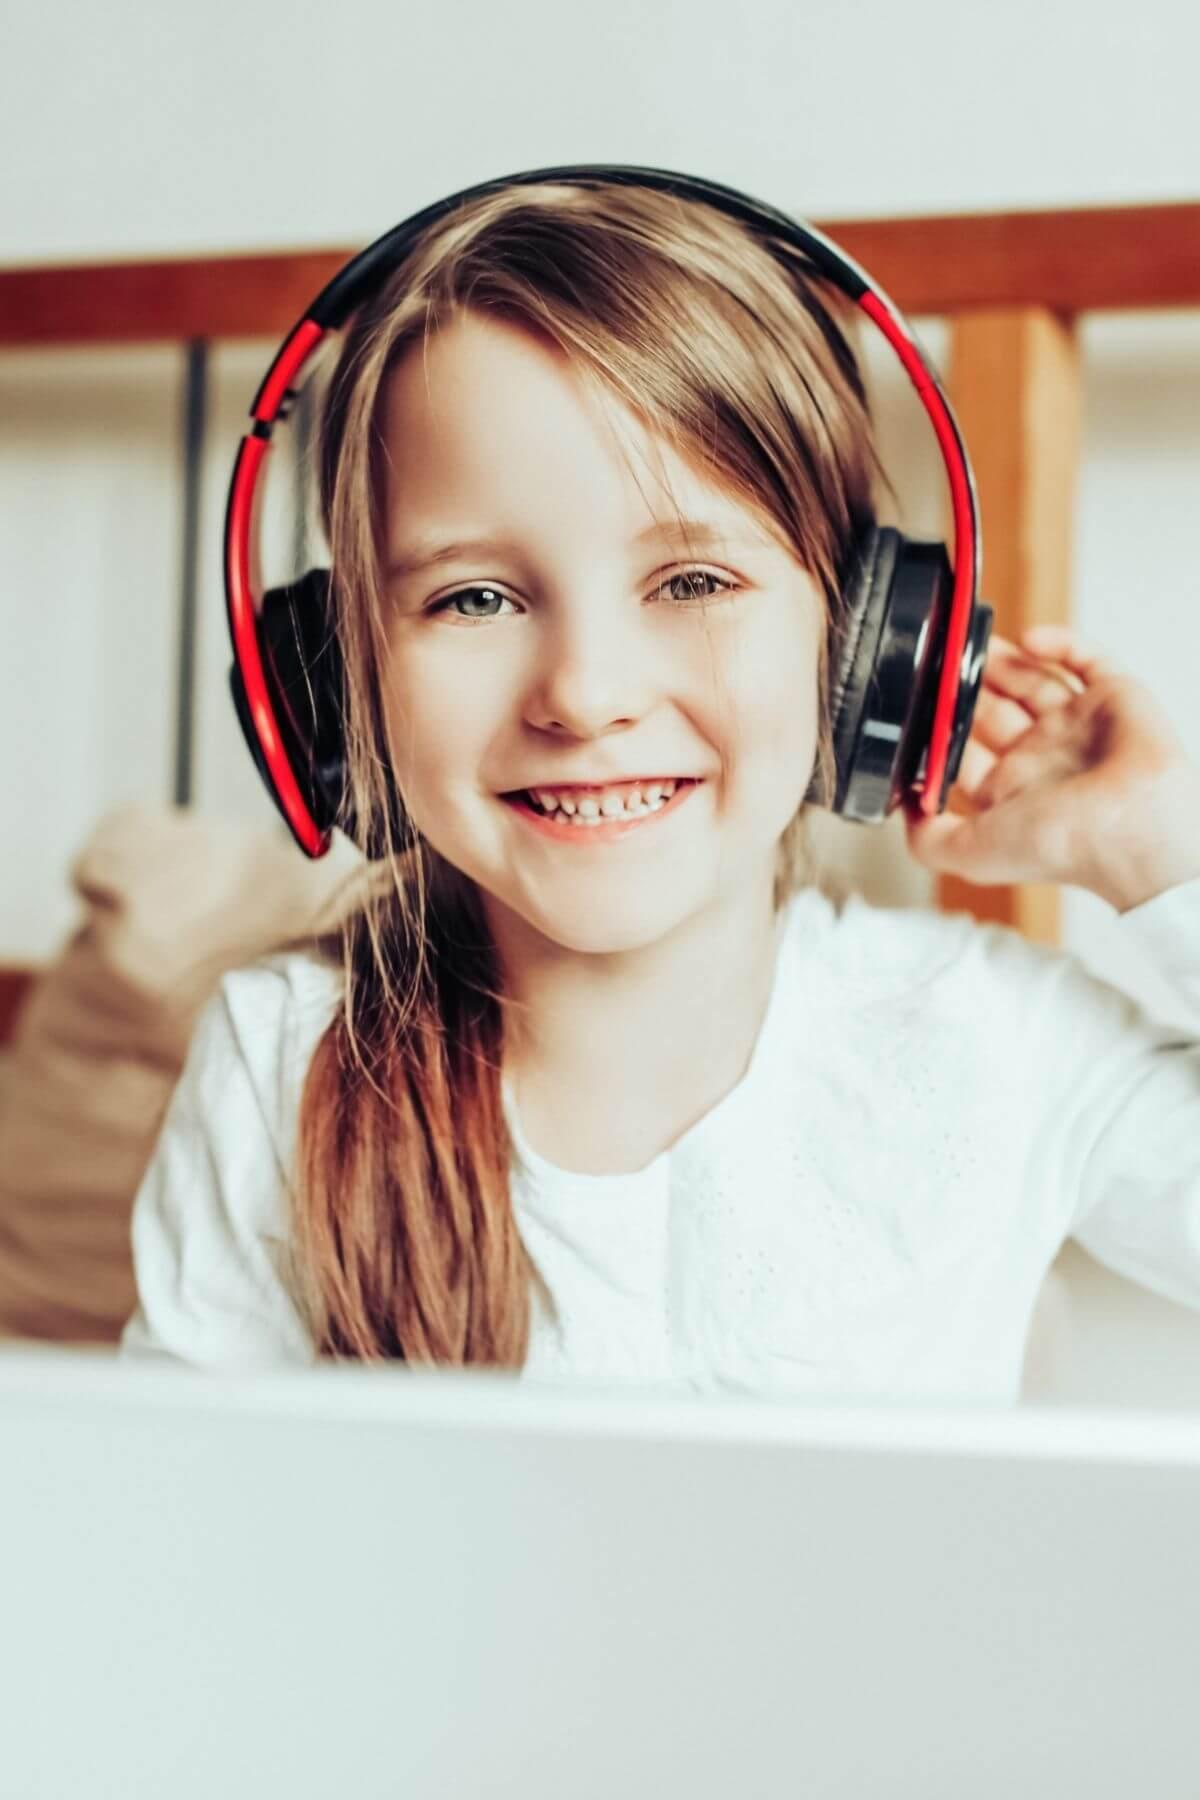 Child listening to audiobook